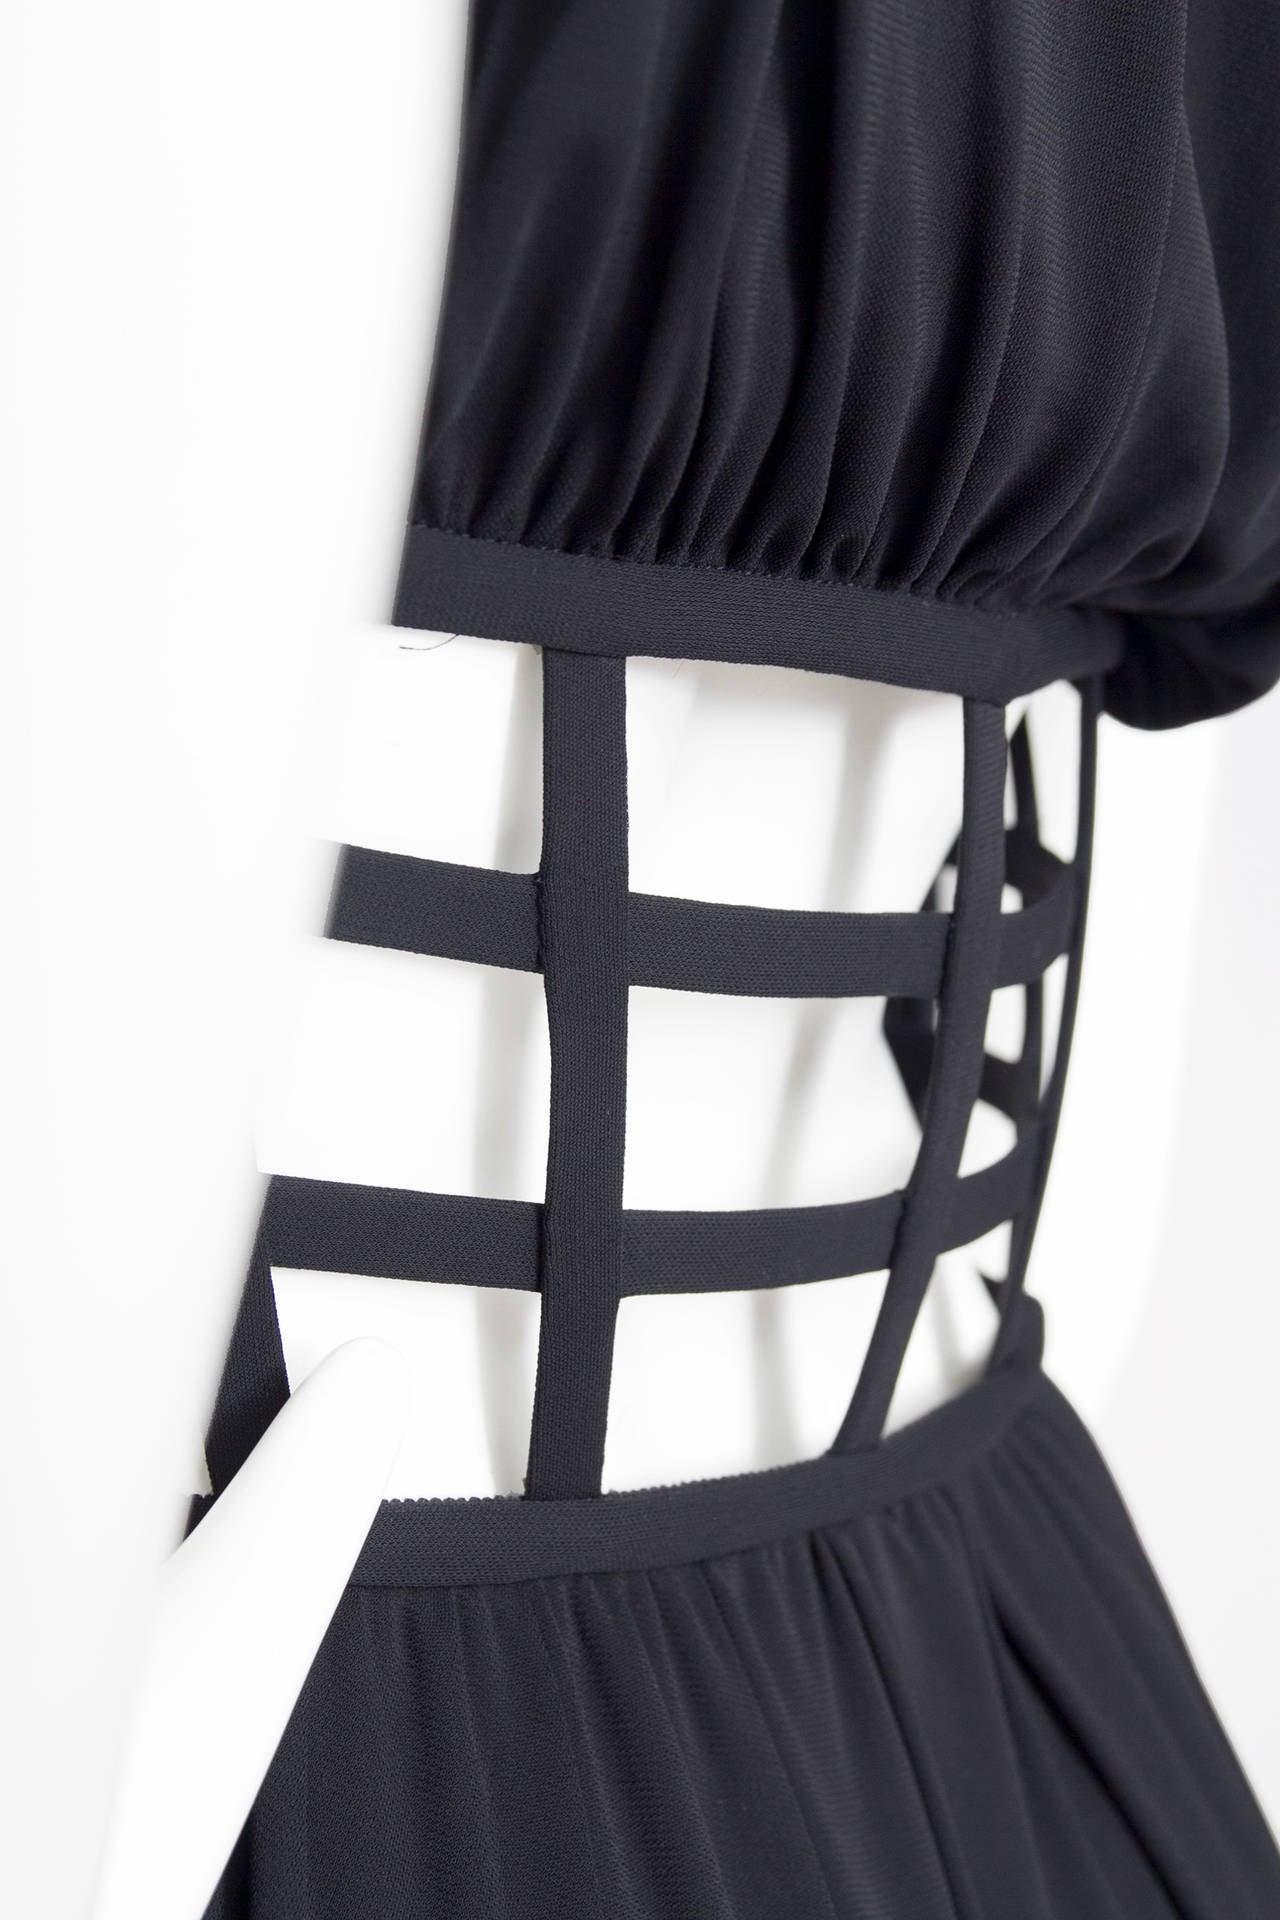 1990s Jean Paul Gaultier Black Corset Dress 7